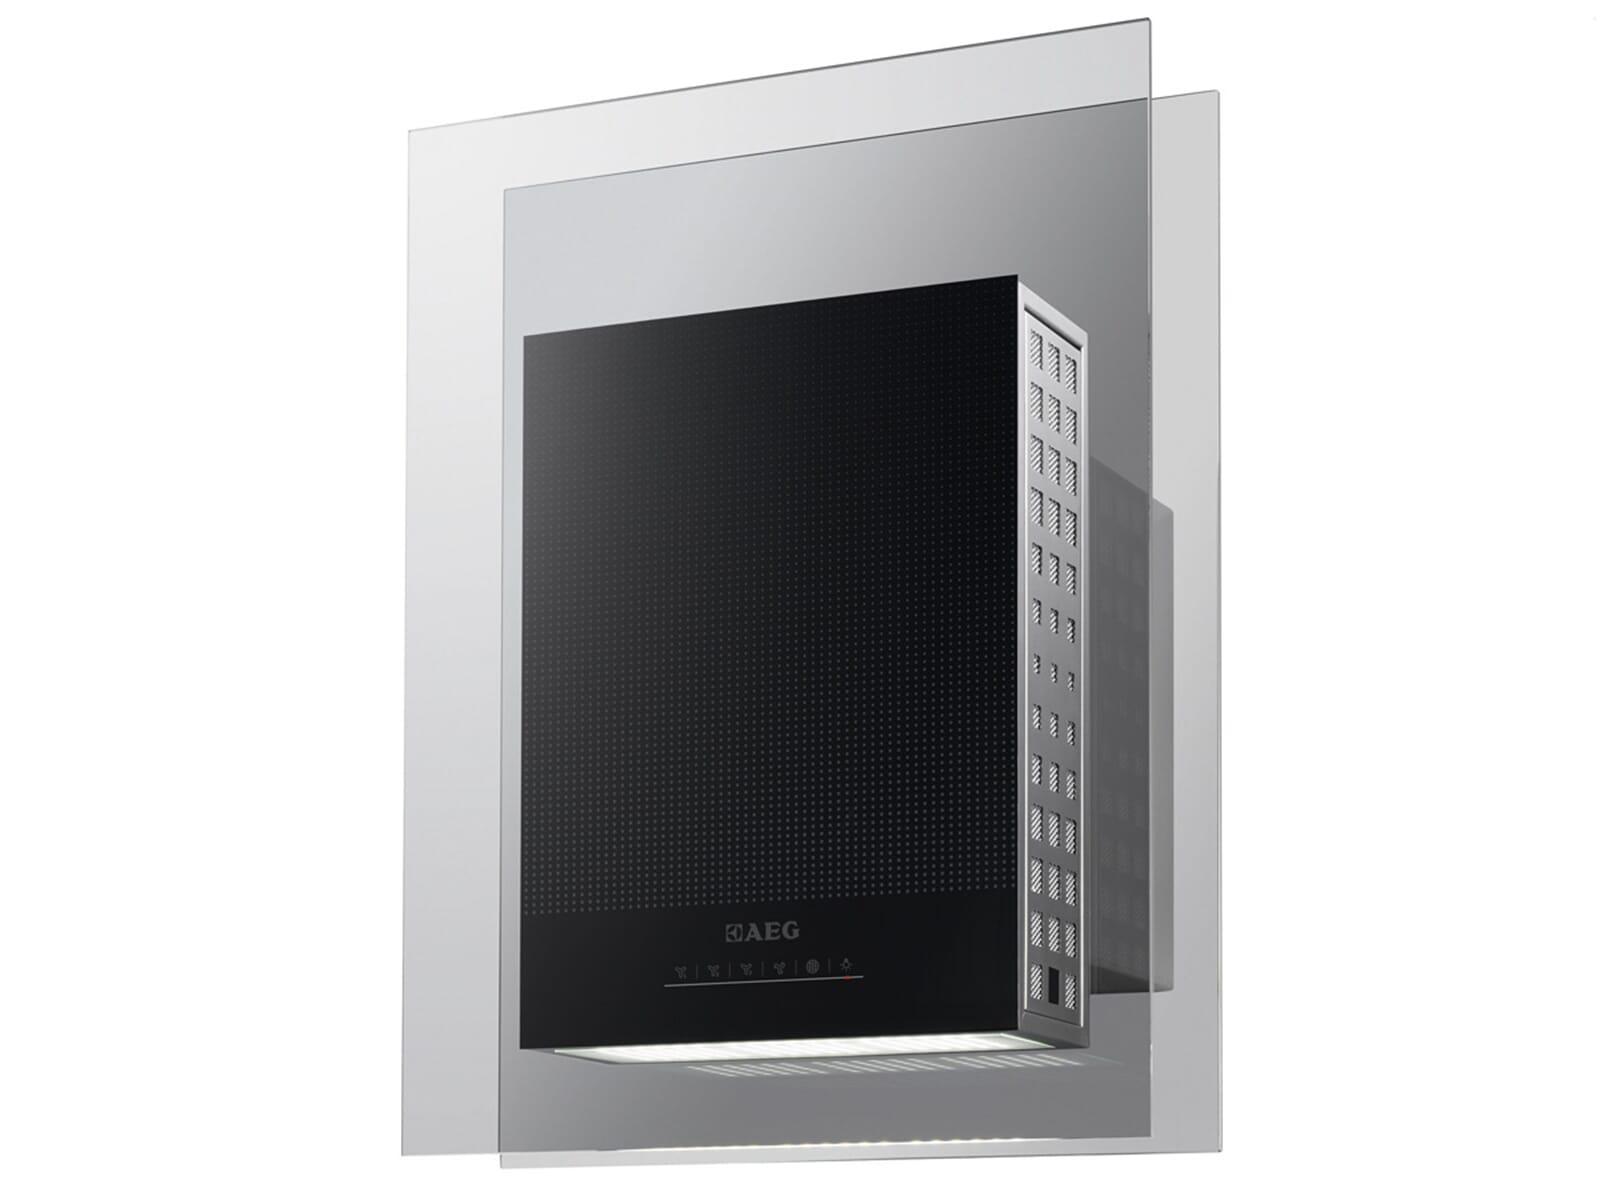 aeg x94484mv1 kopffrei wand dunstabzugshaube edelstahl glas kopfreihaube 45cm ebay. Black Bedroom Furniture Sets. Home Design Ideas